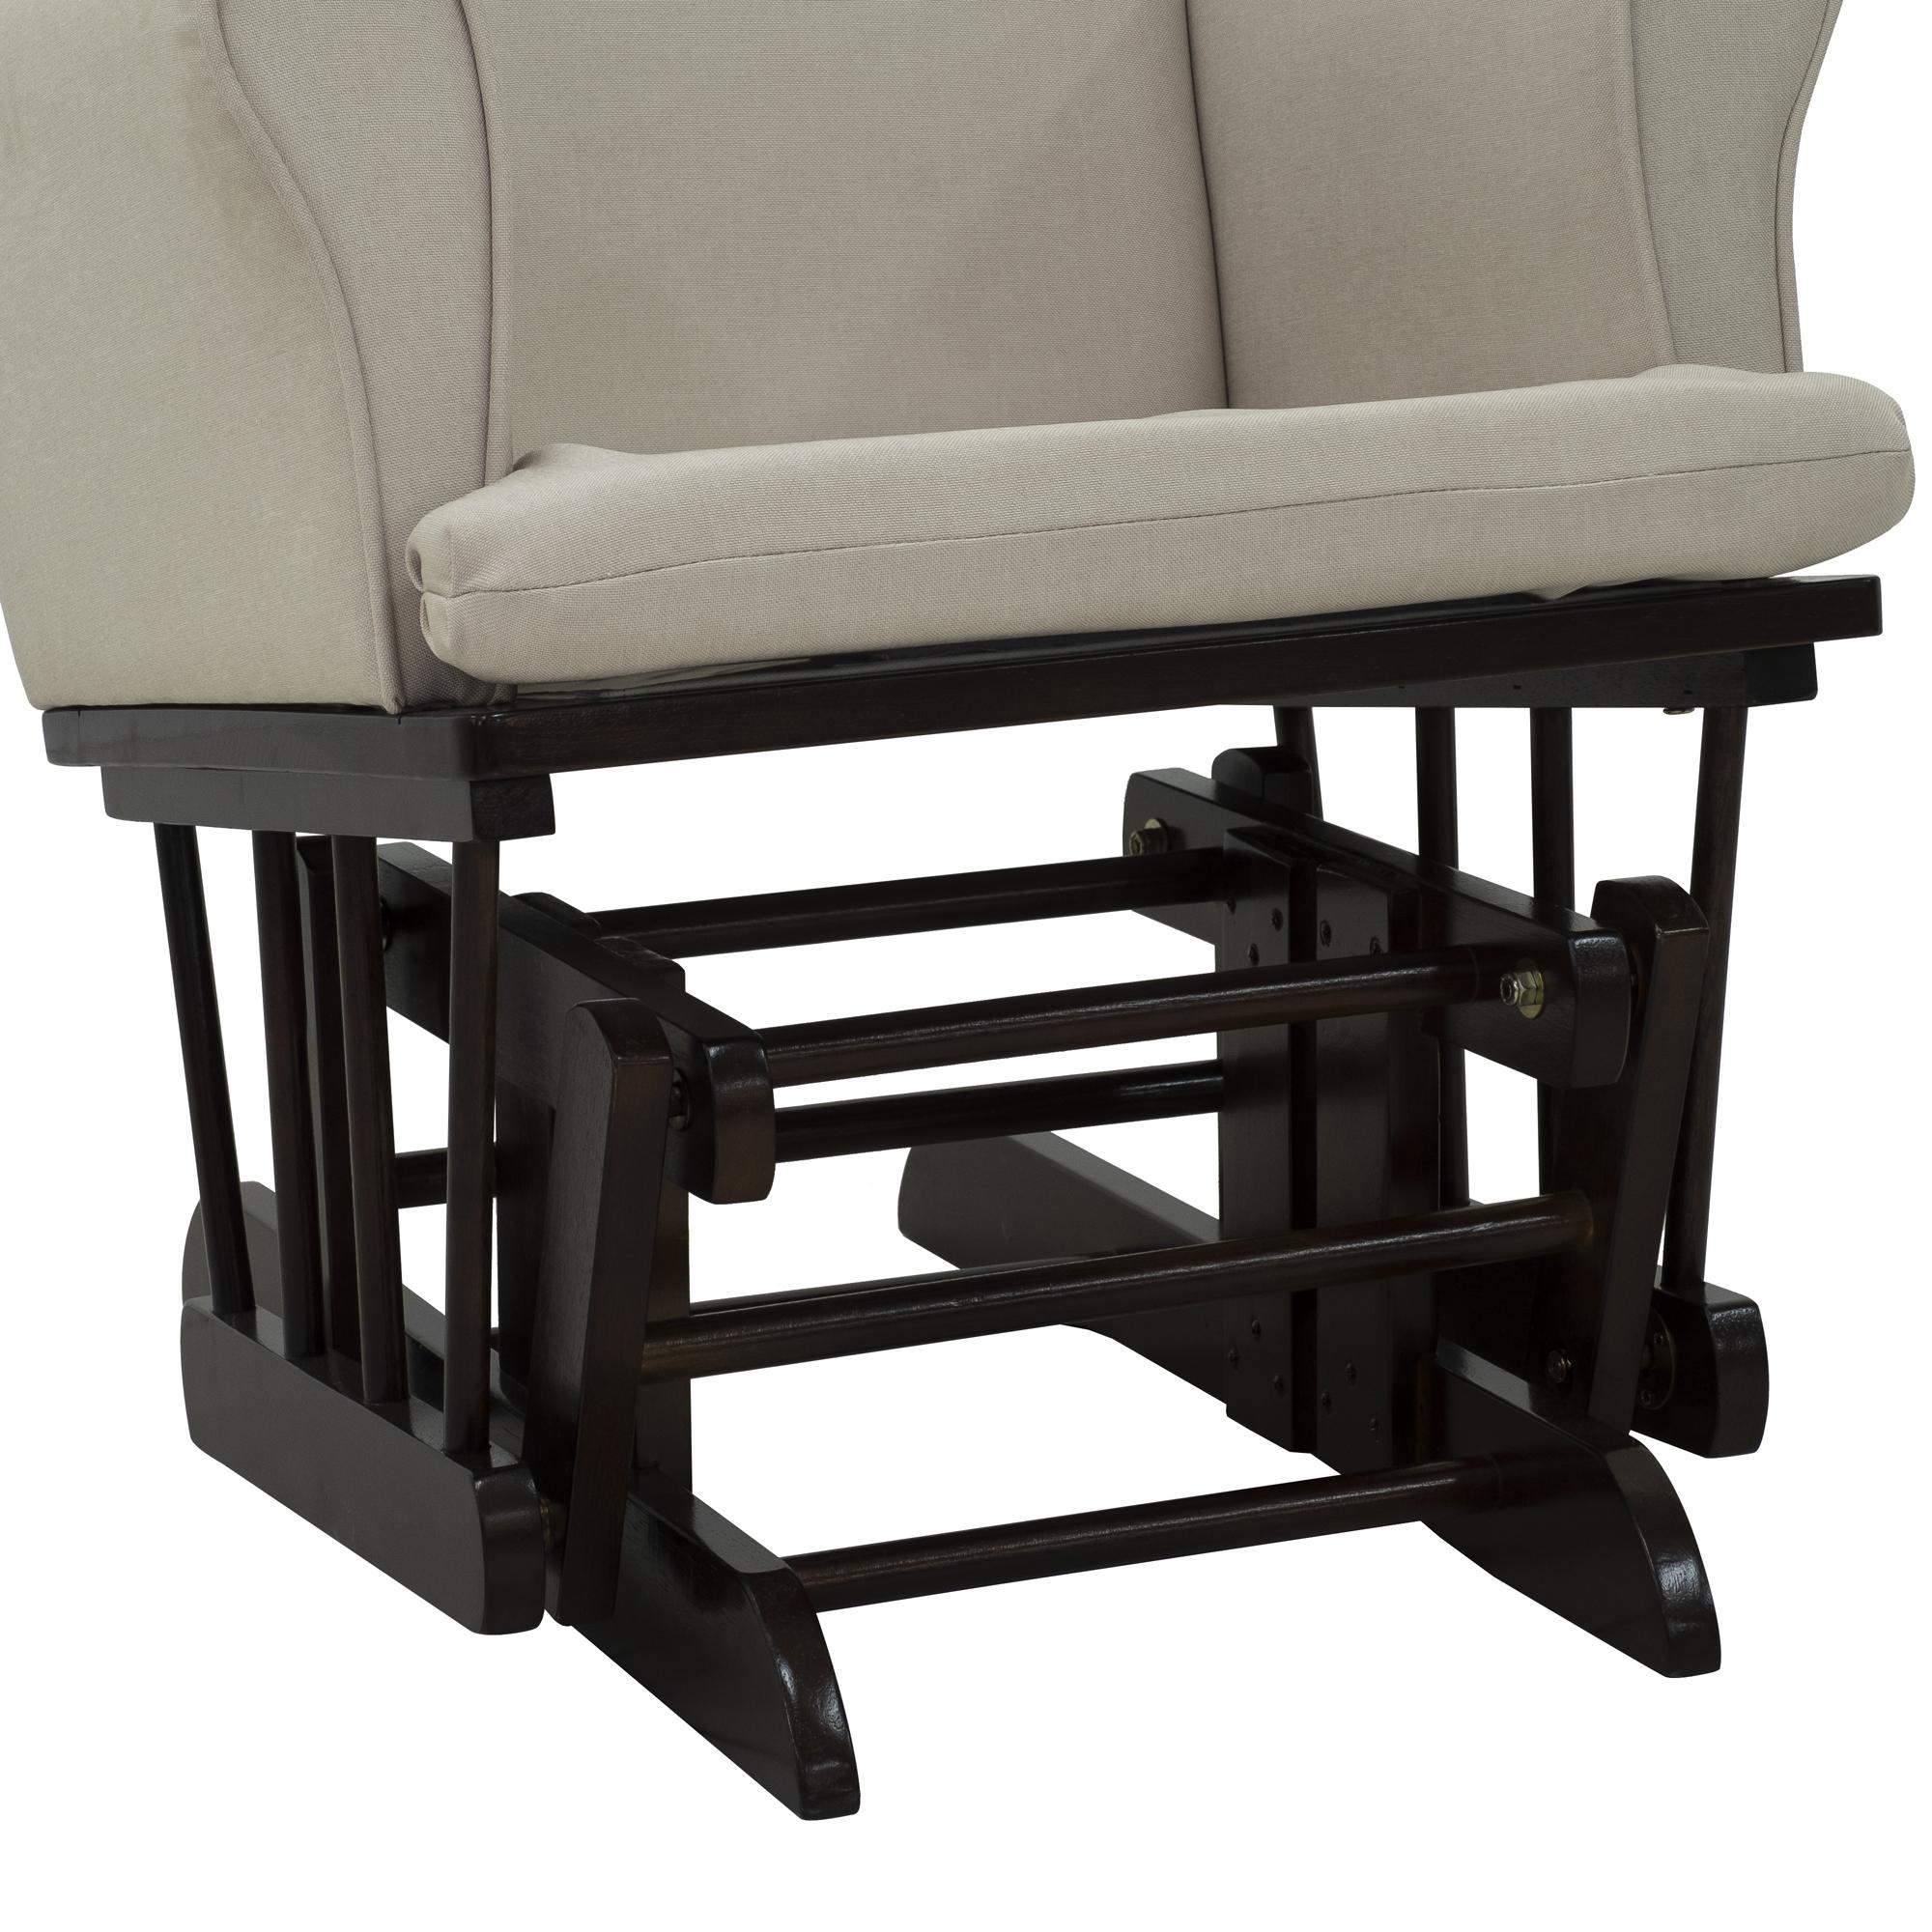 Details About 2PC Baby Nursery Relax Rocker Rocking Chair Glider U0026 Ottoman  Sofa Set